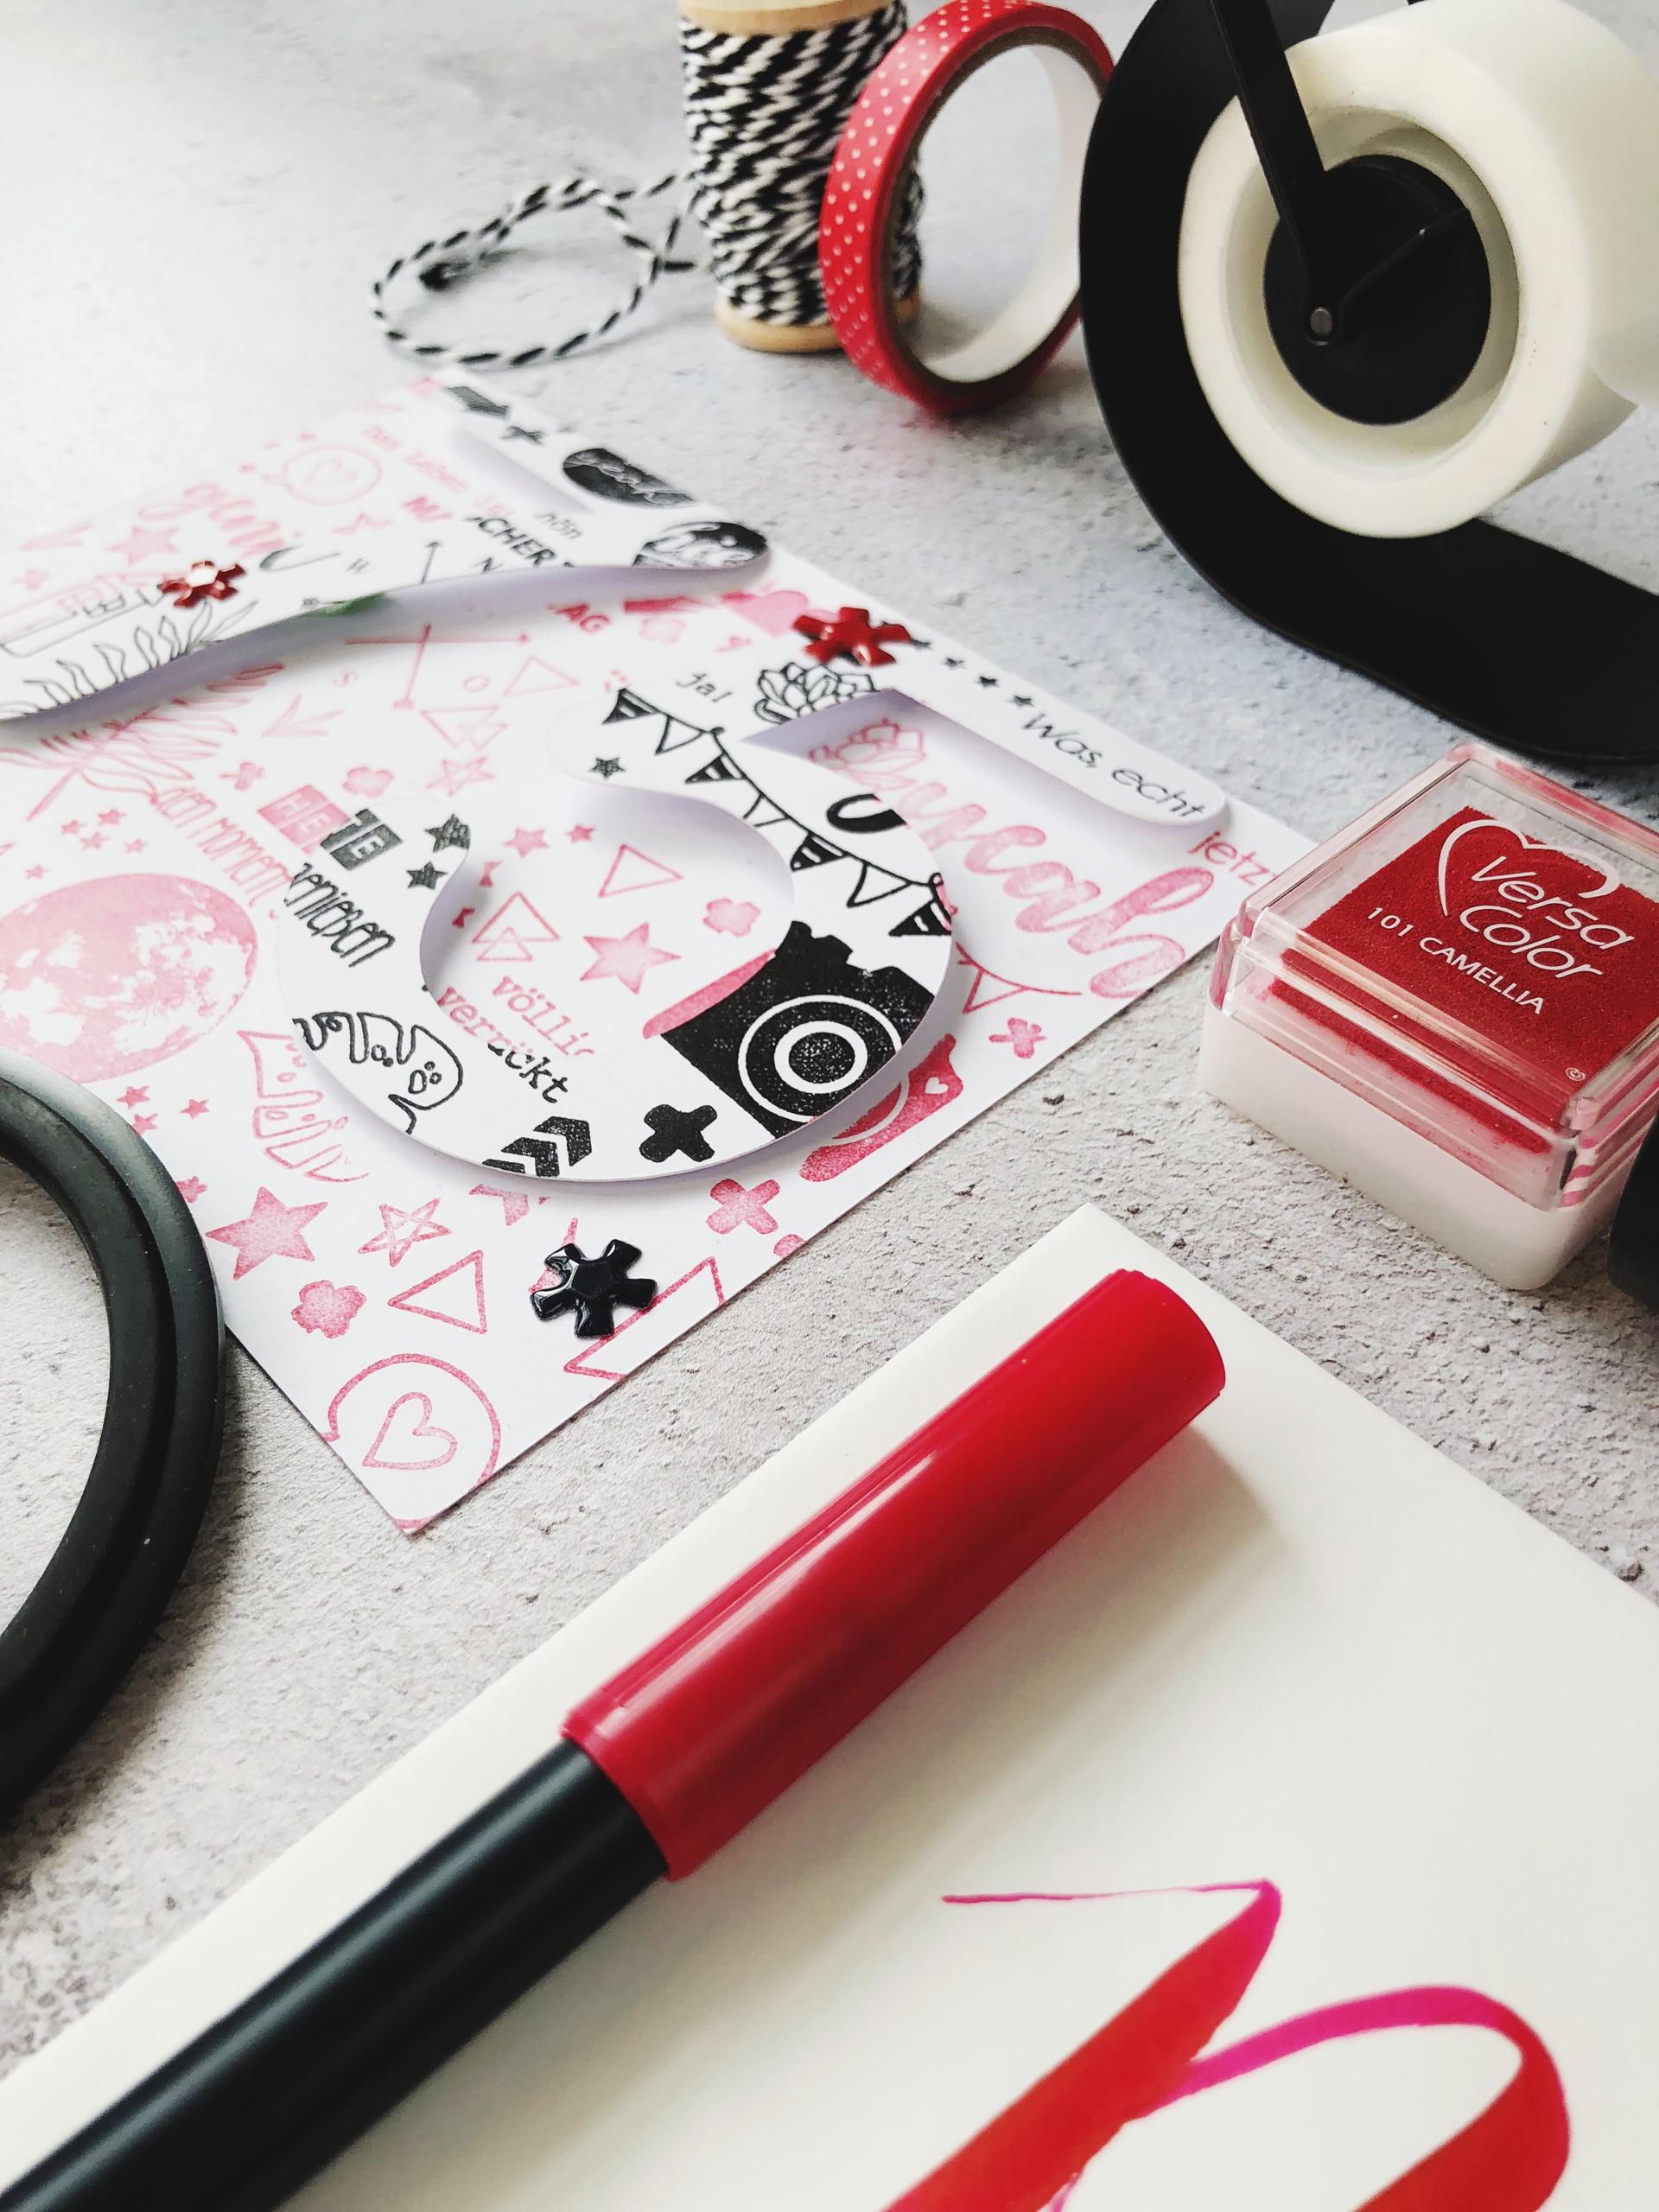 Diy Geburtstagskarte Zum 75 Geburtstag Papierprojekt Blog